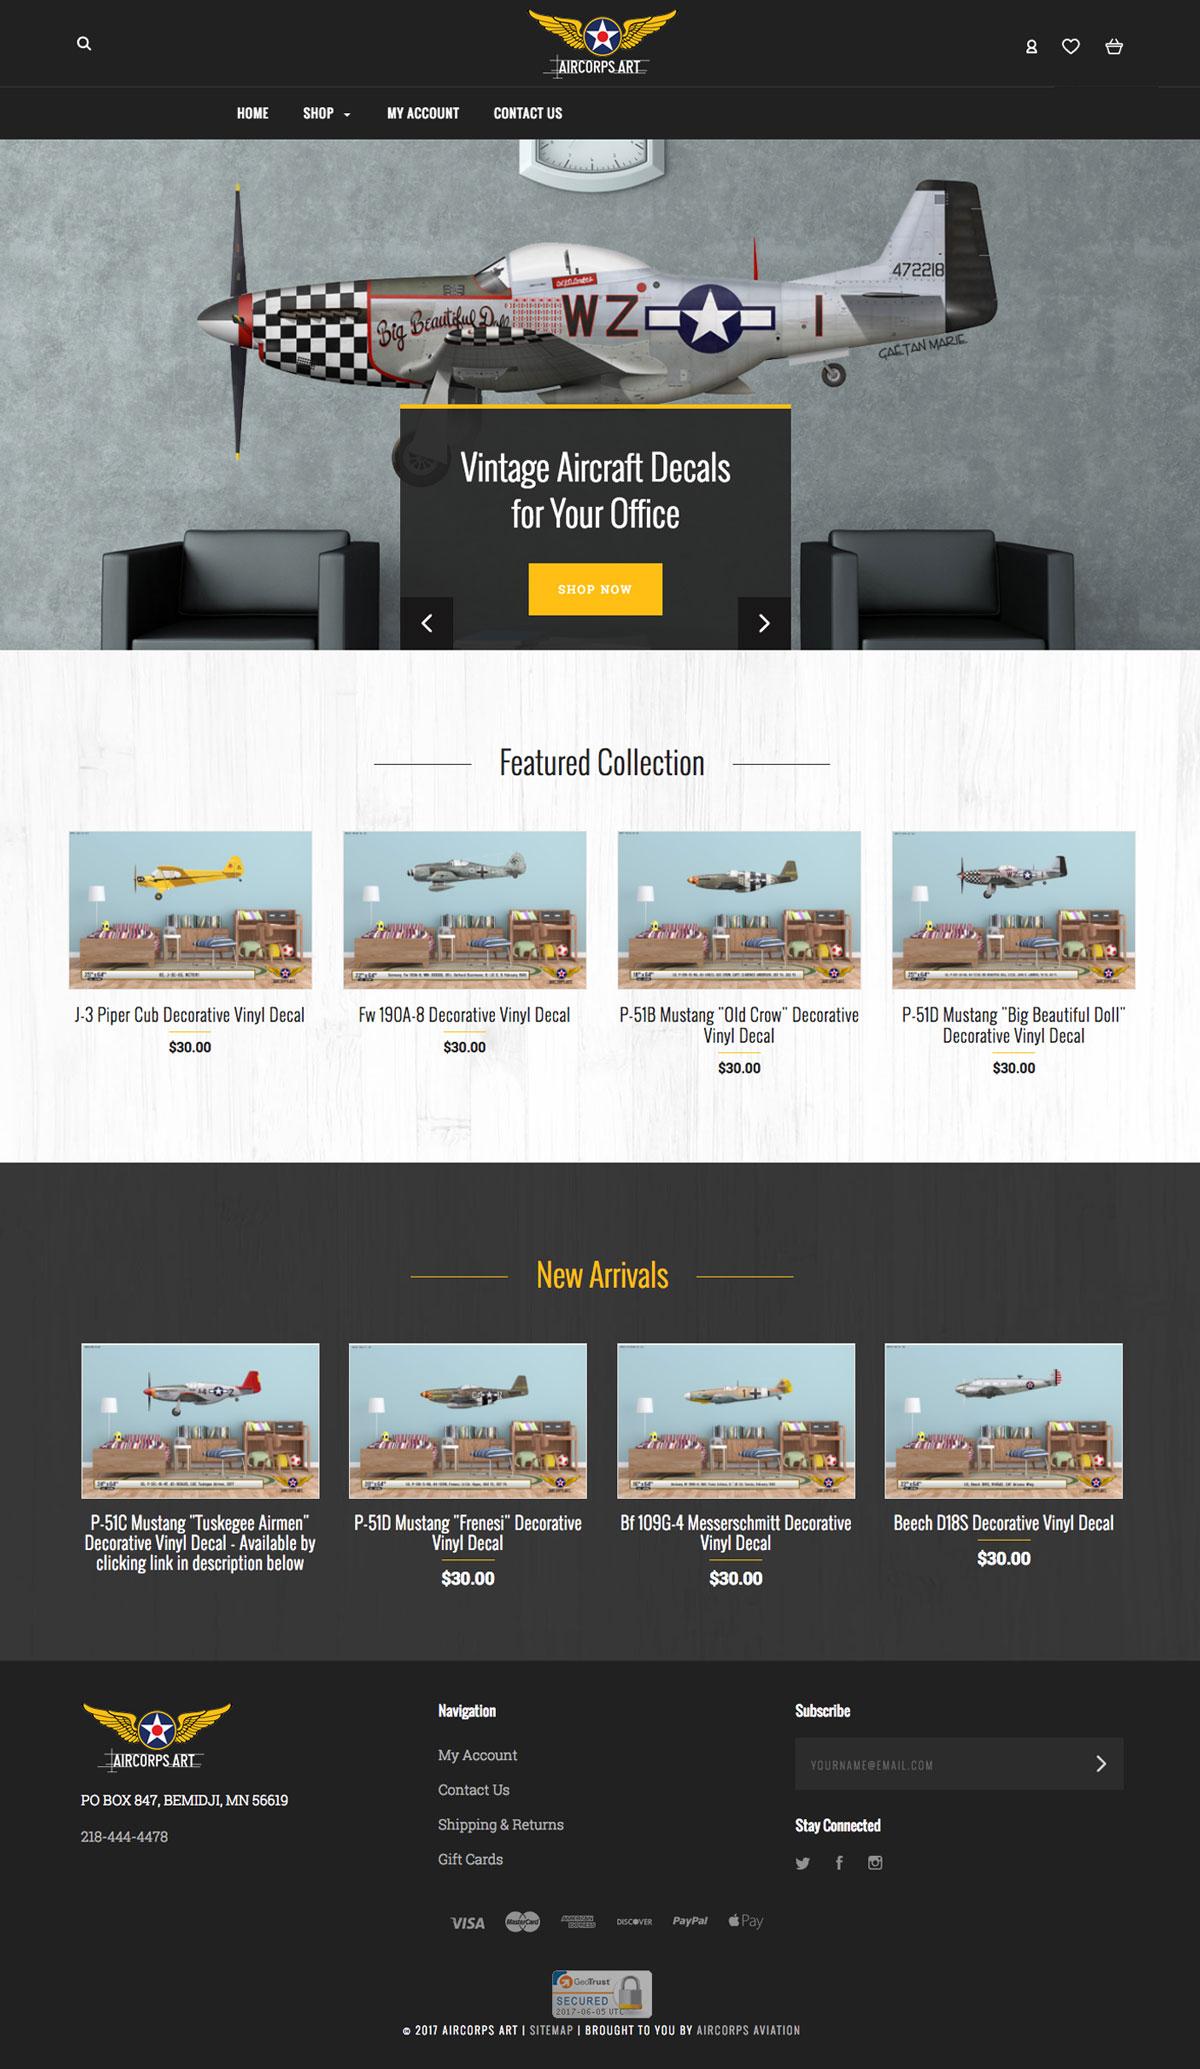 AirCorps Art website bigcommerce